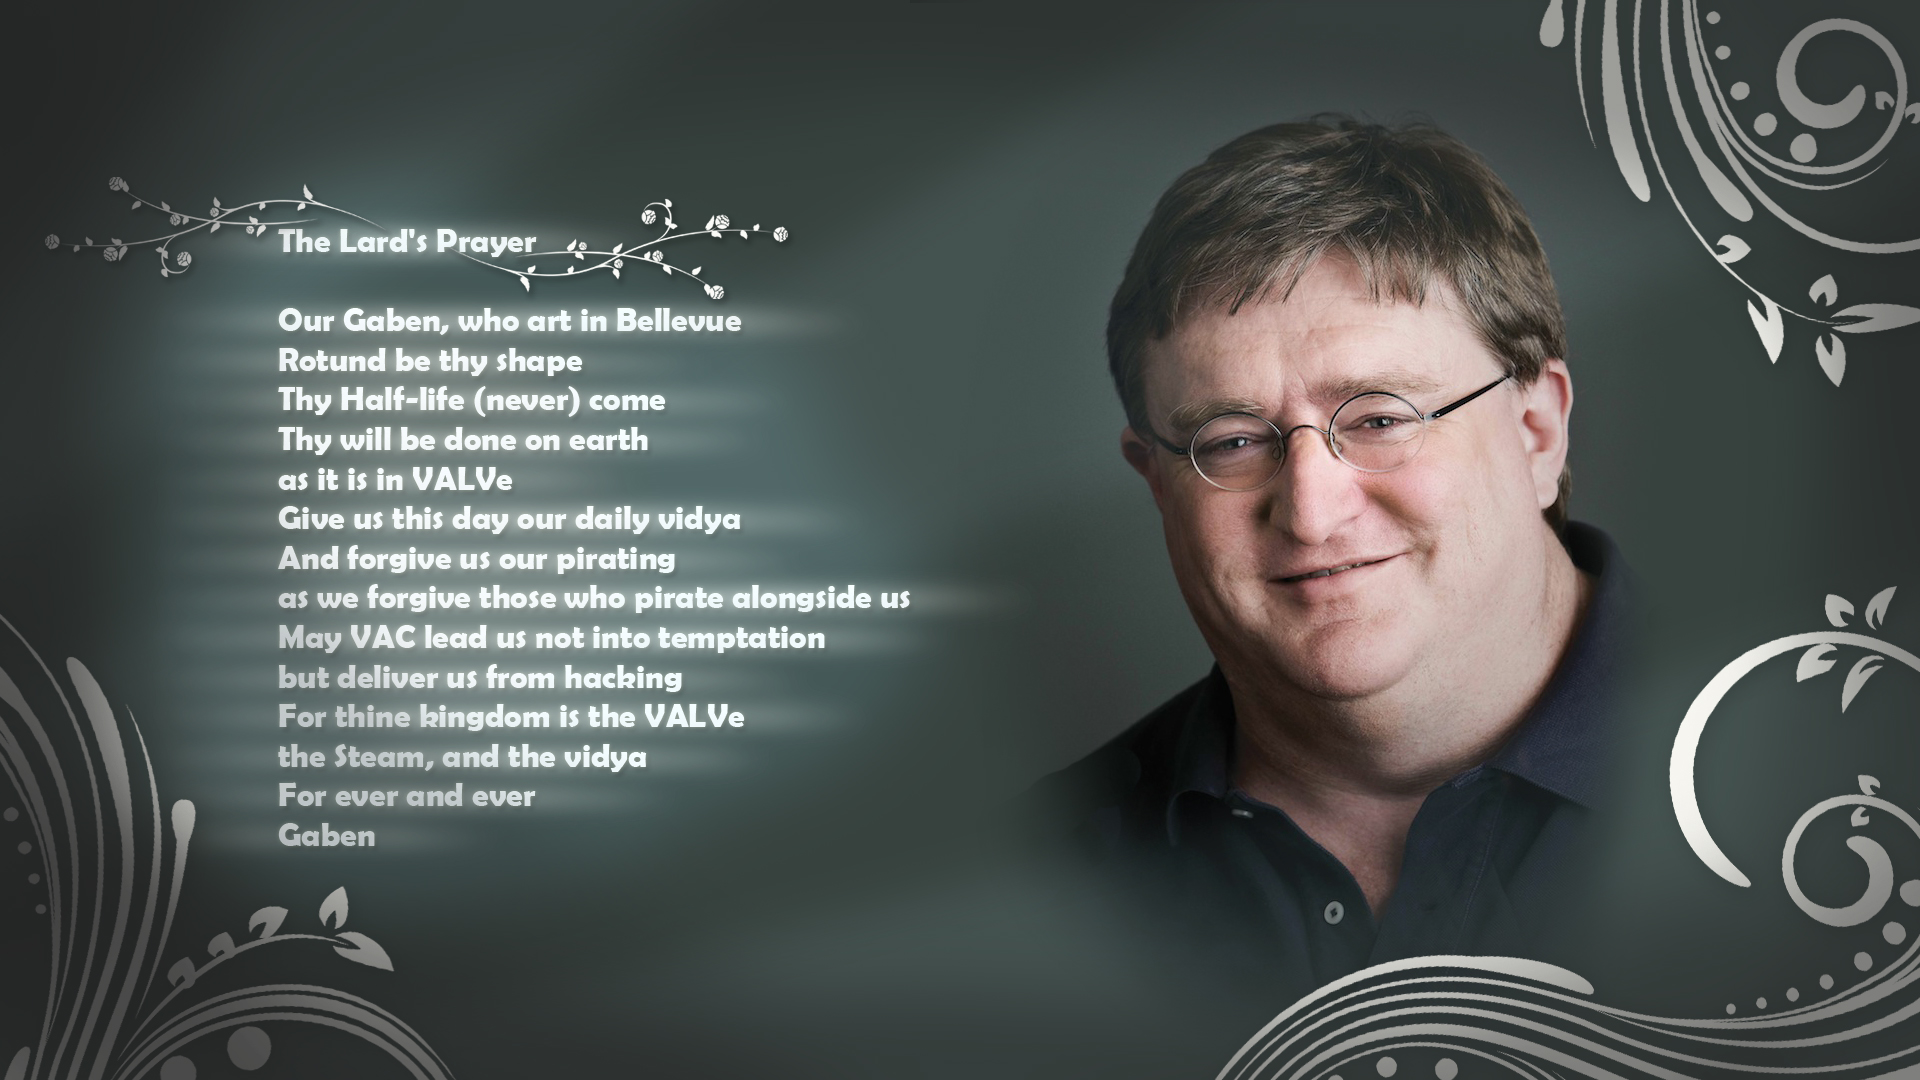 1082634da52 Gabe Newell - The Lard s Prayer